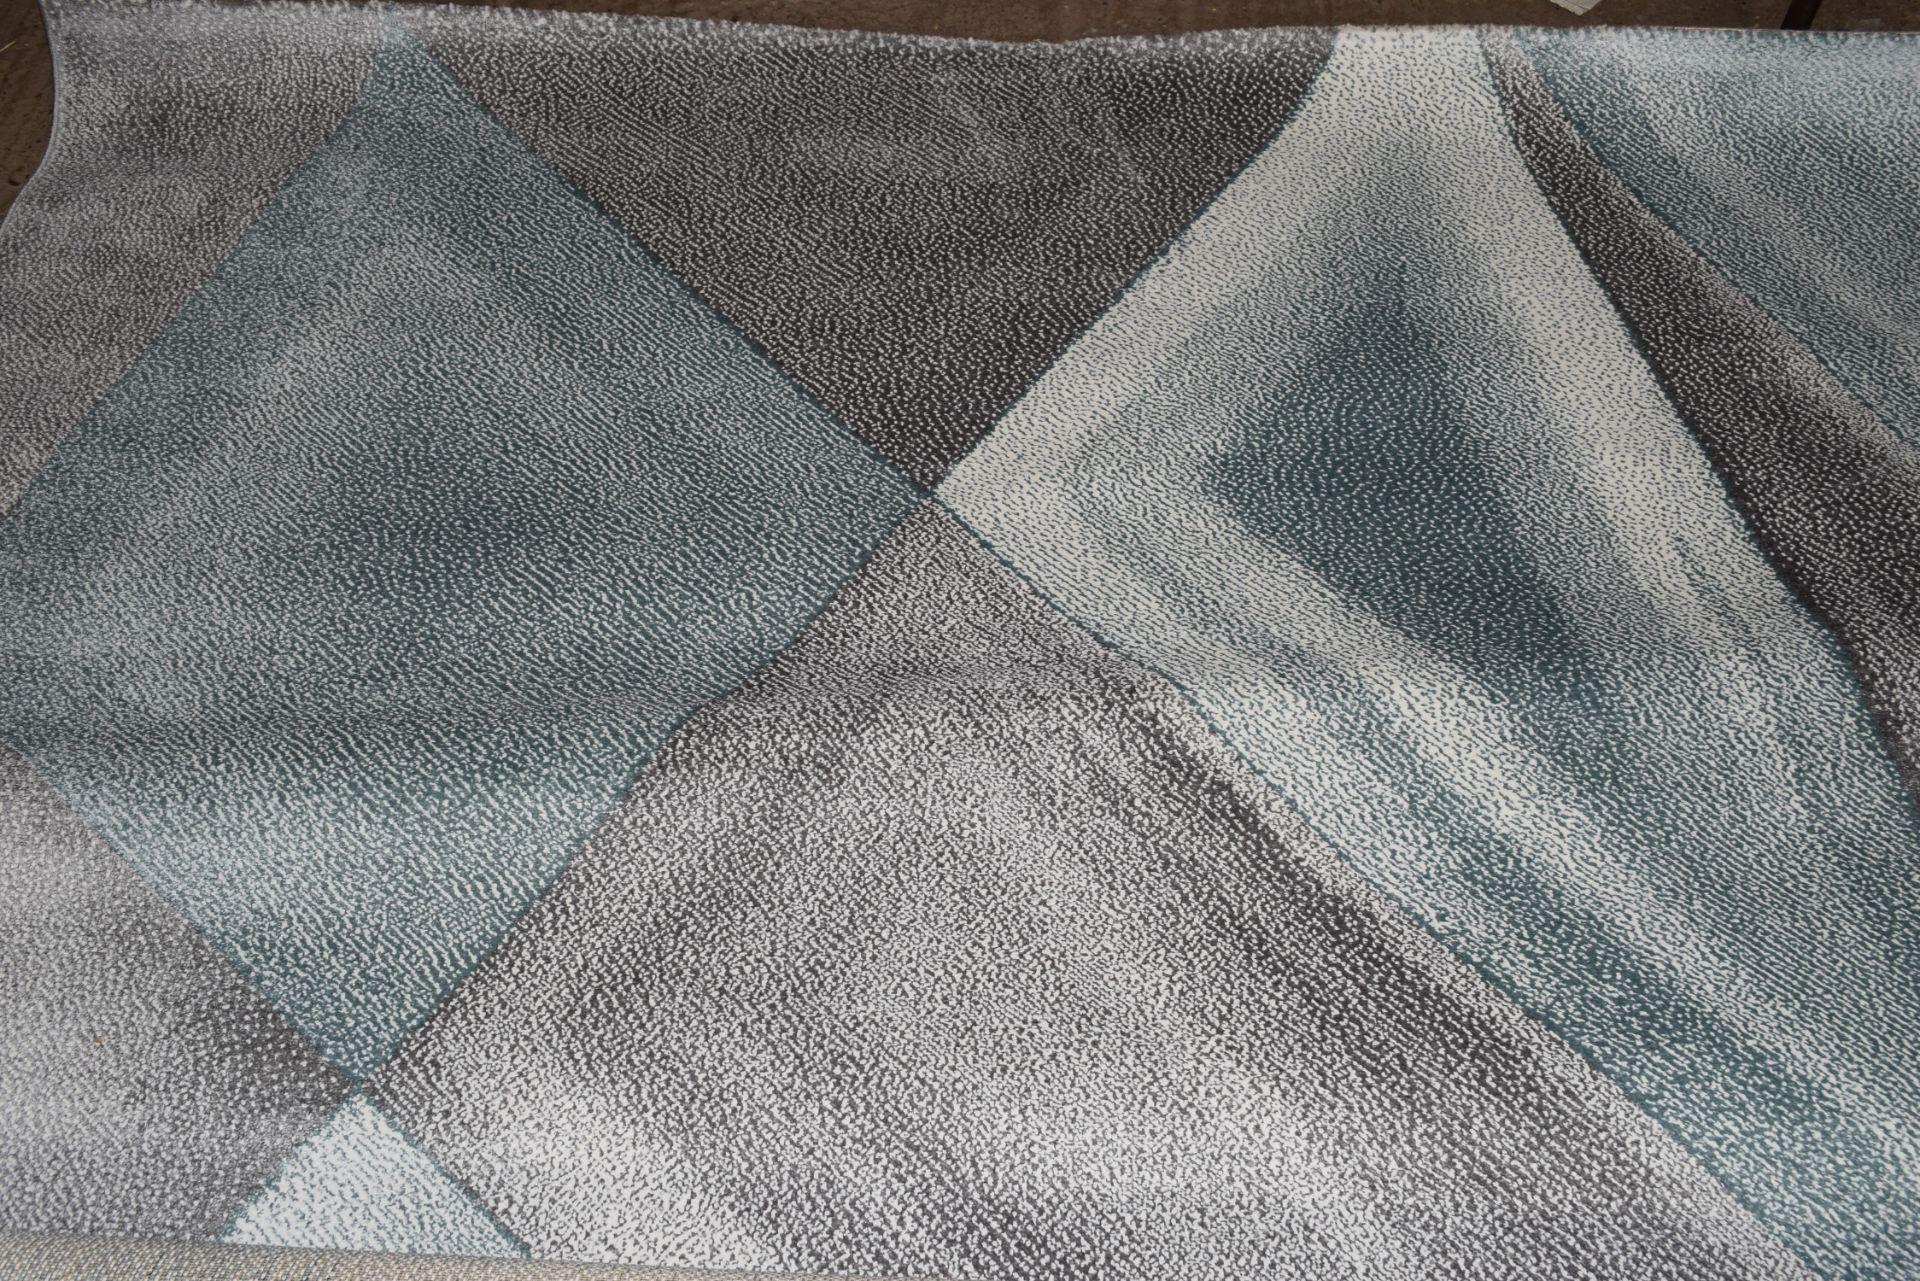 Norden Home flat weave rug, blue/grey, 160 x 230cm. RRP £67.99